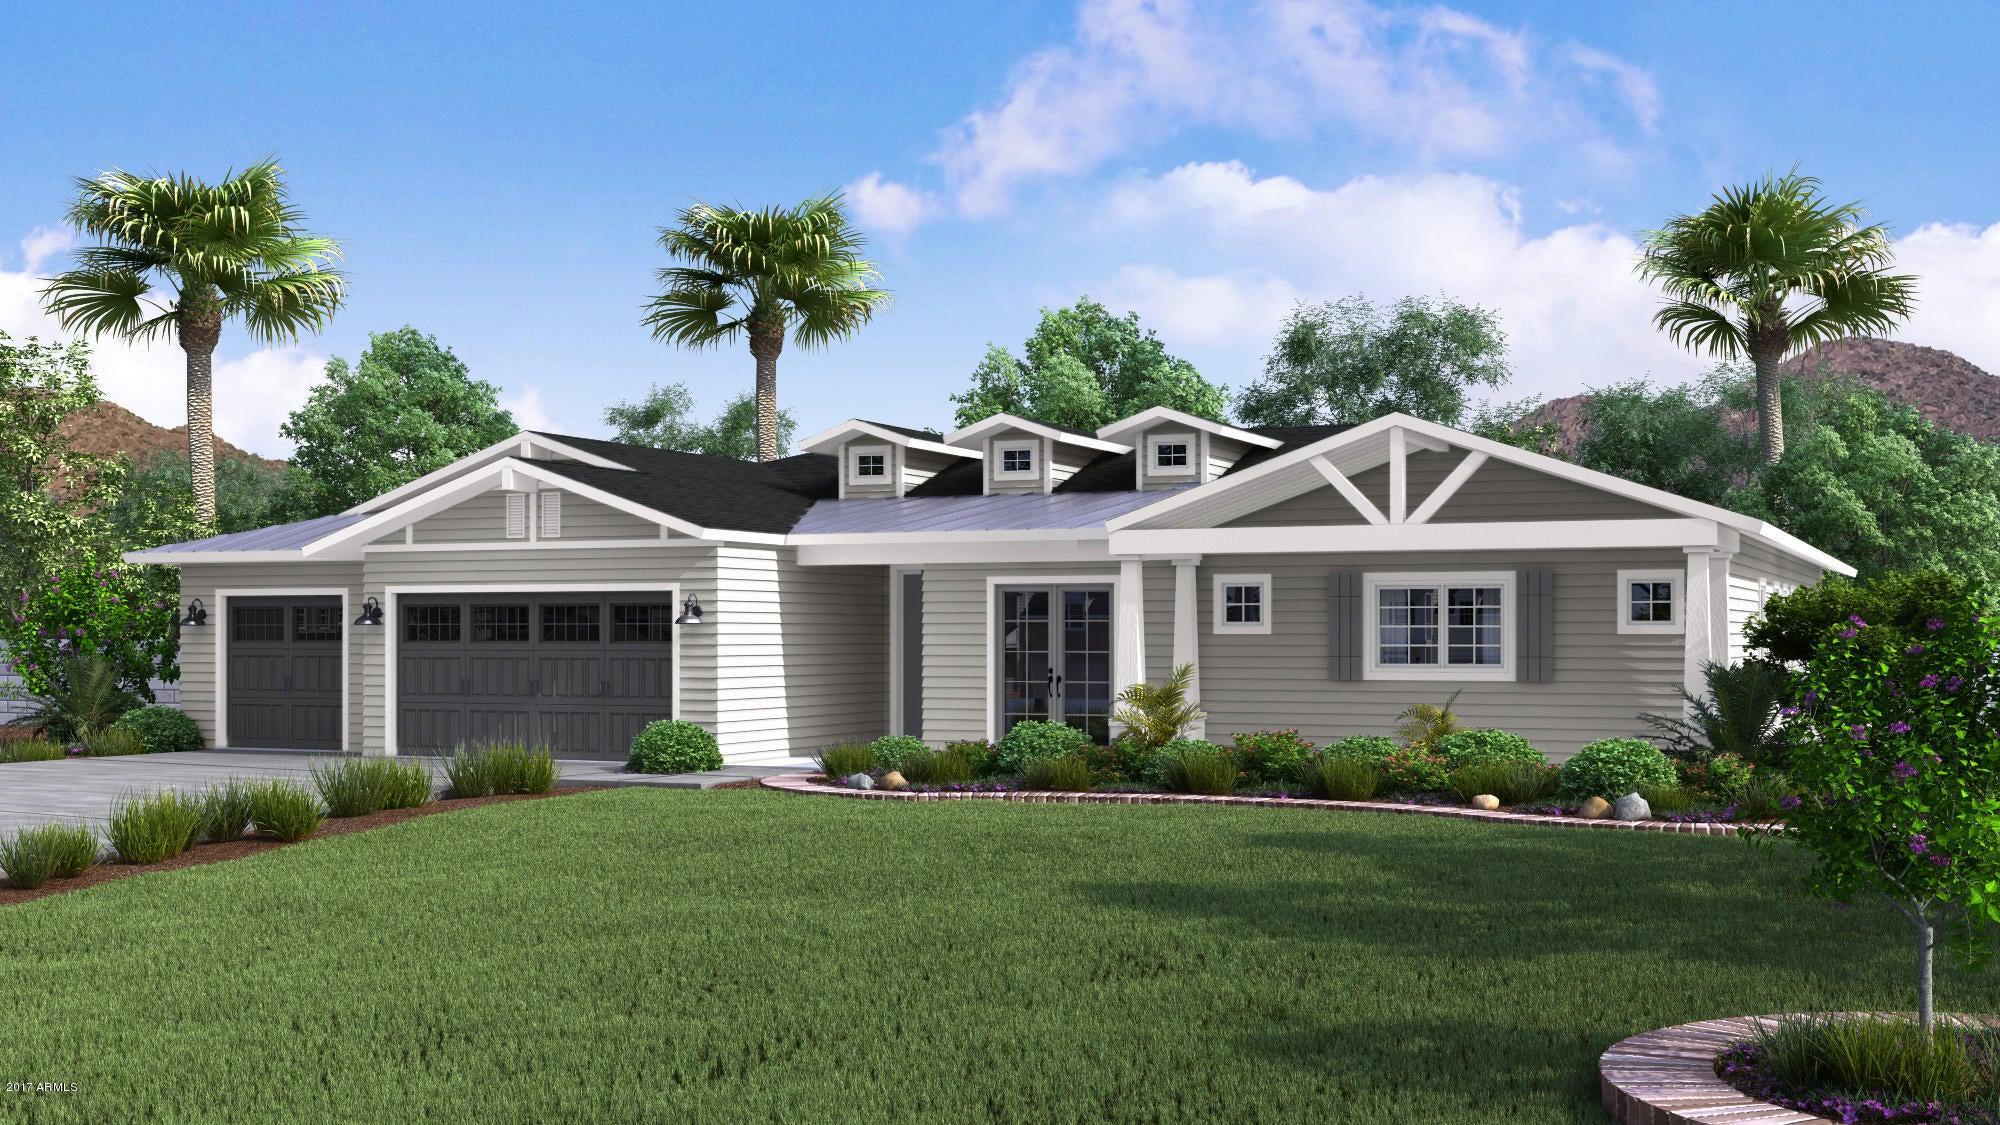 5402 N 42nd Place, Phoenix, AZ 85018